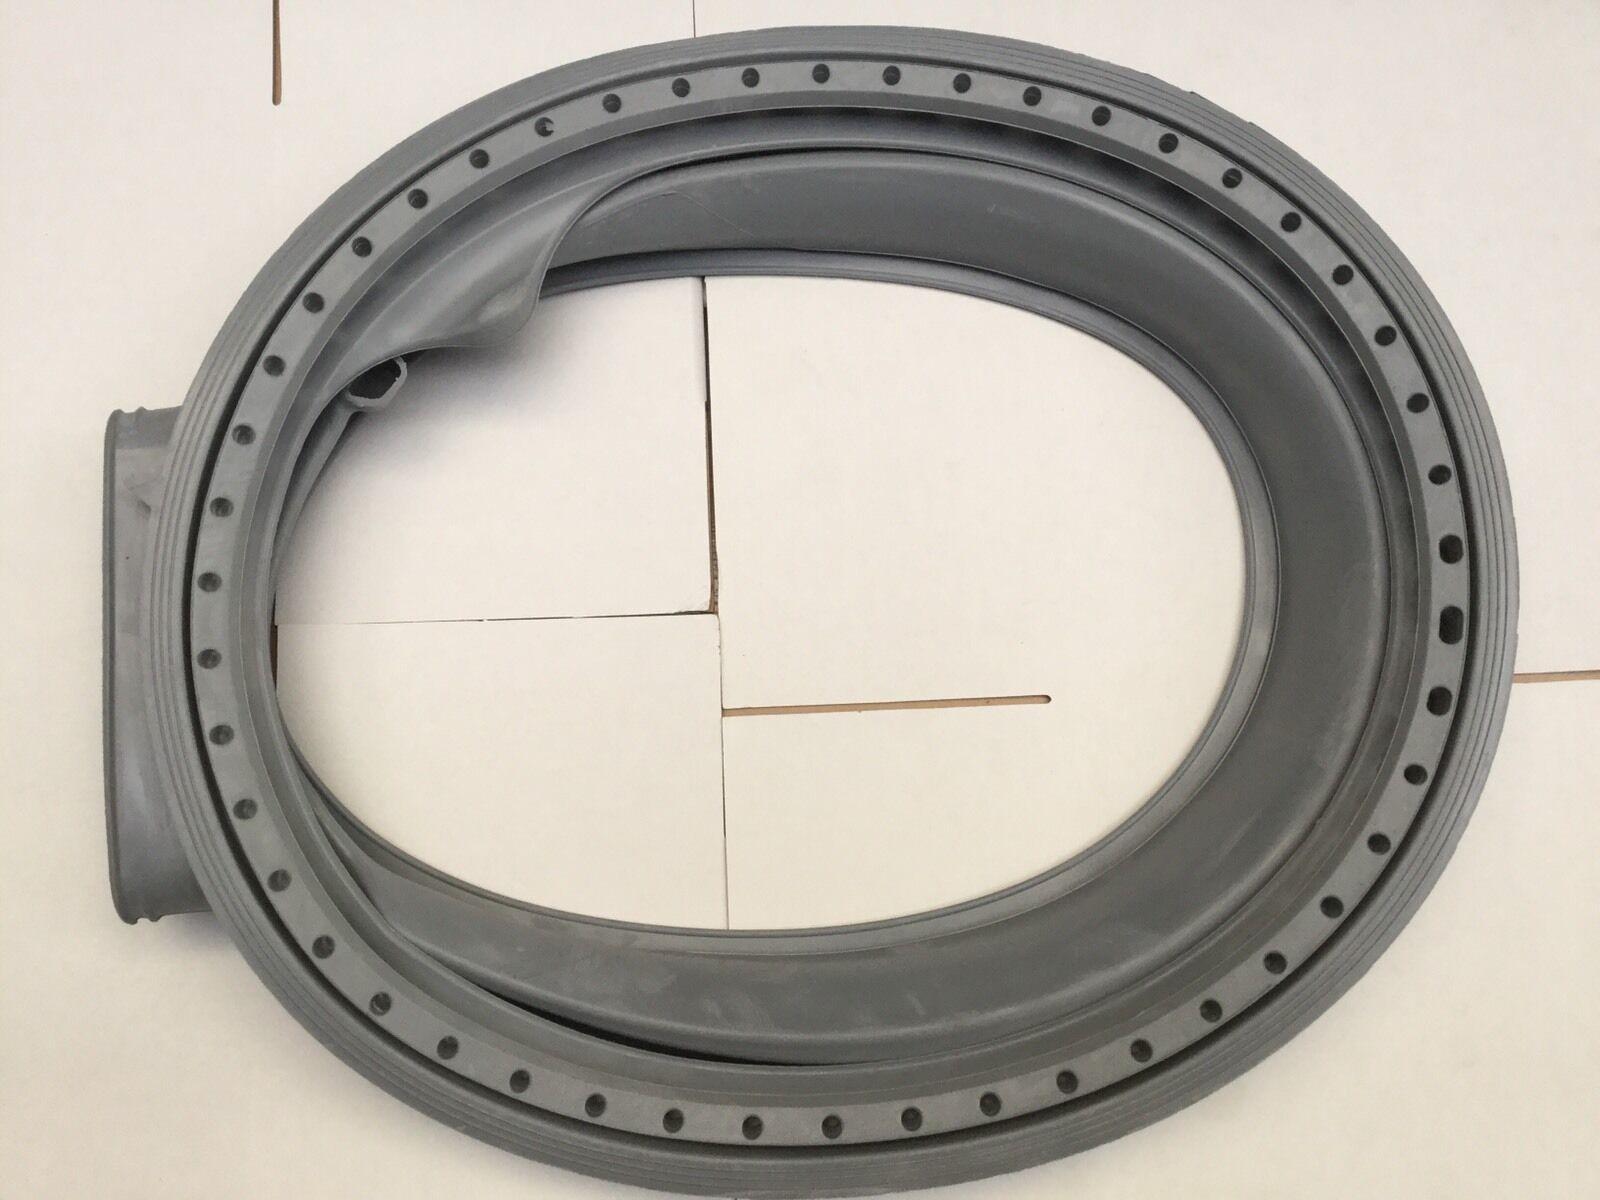 Genuine Electrolux Washer Dryer Combo Door Boot Seal Gasket EWW12832 914900334